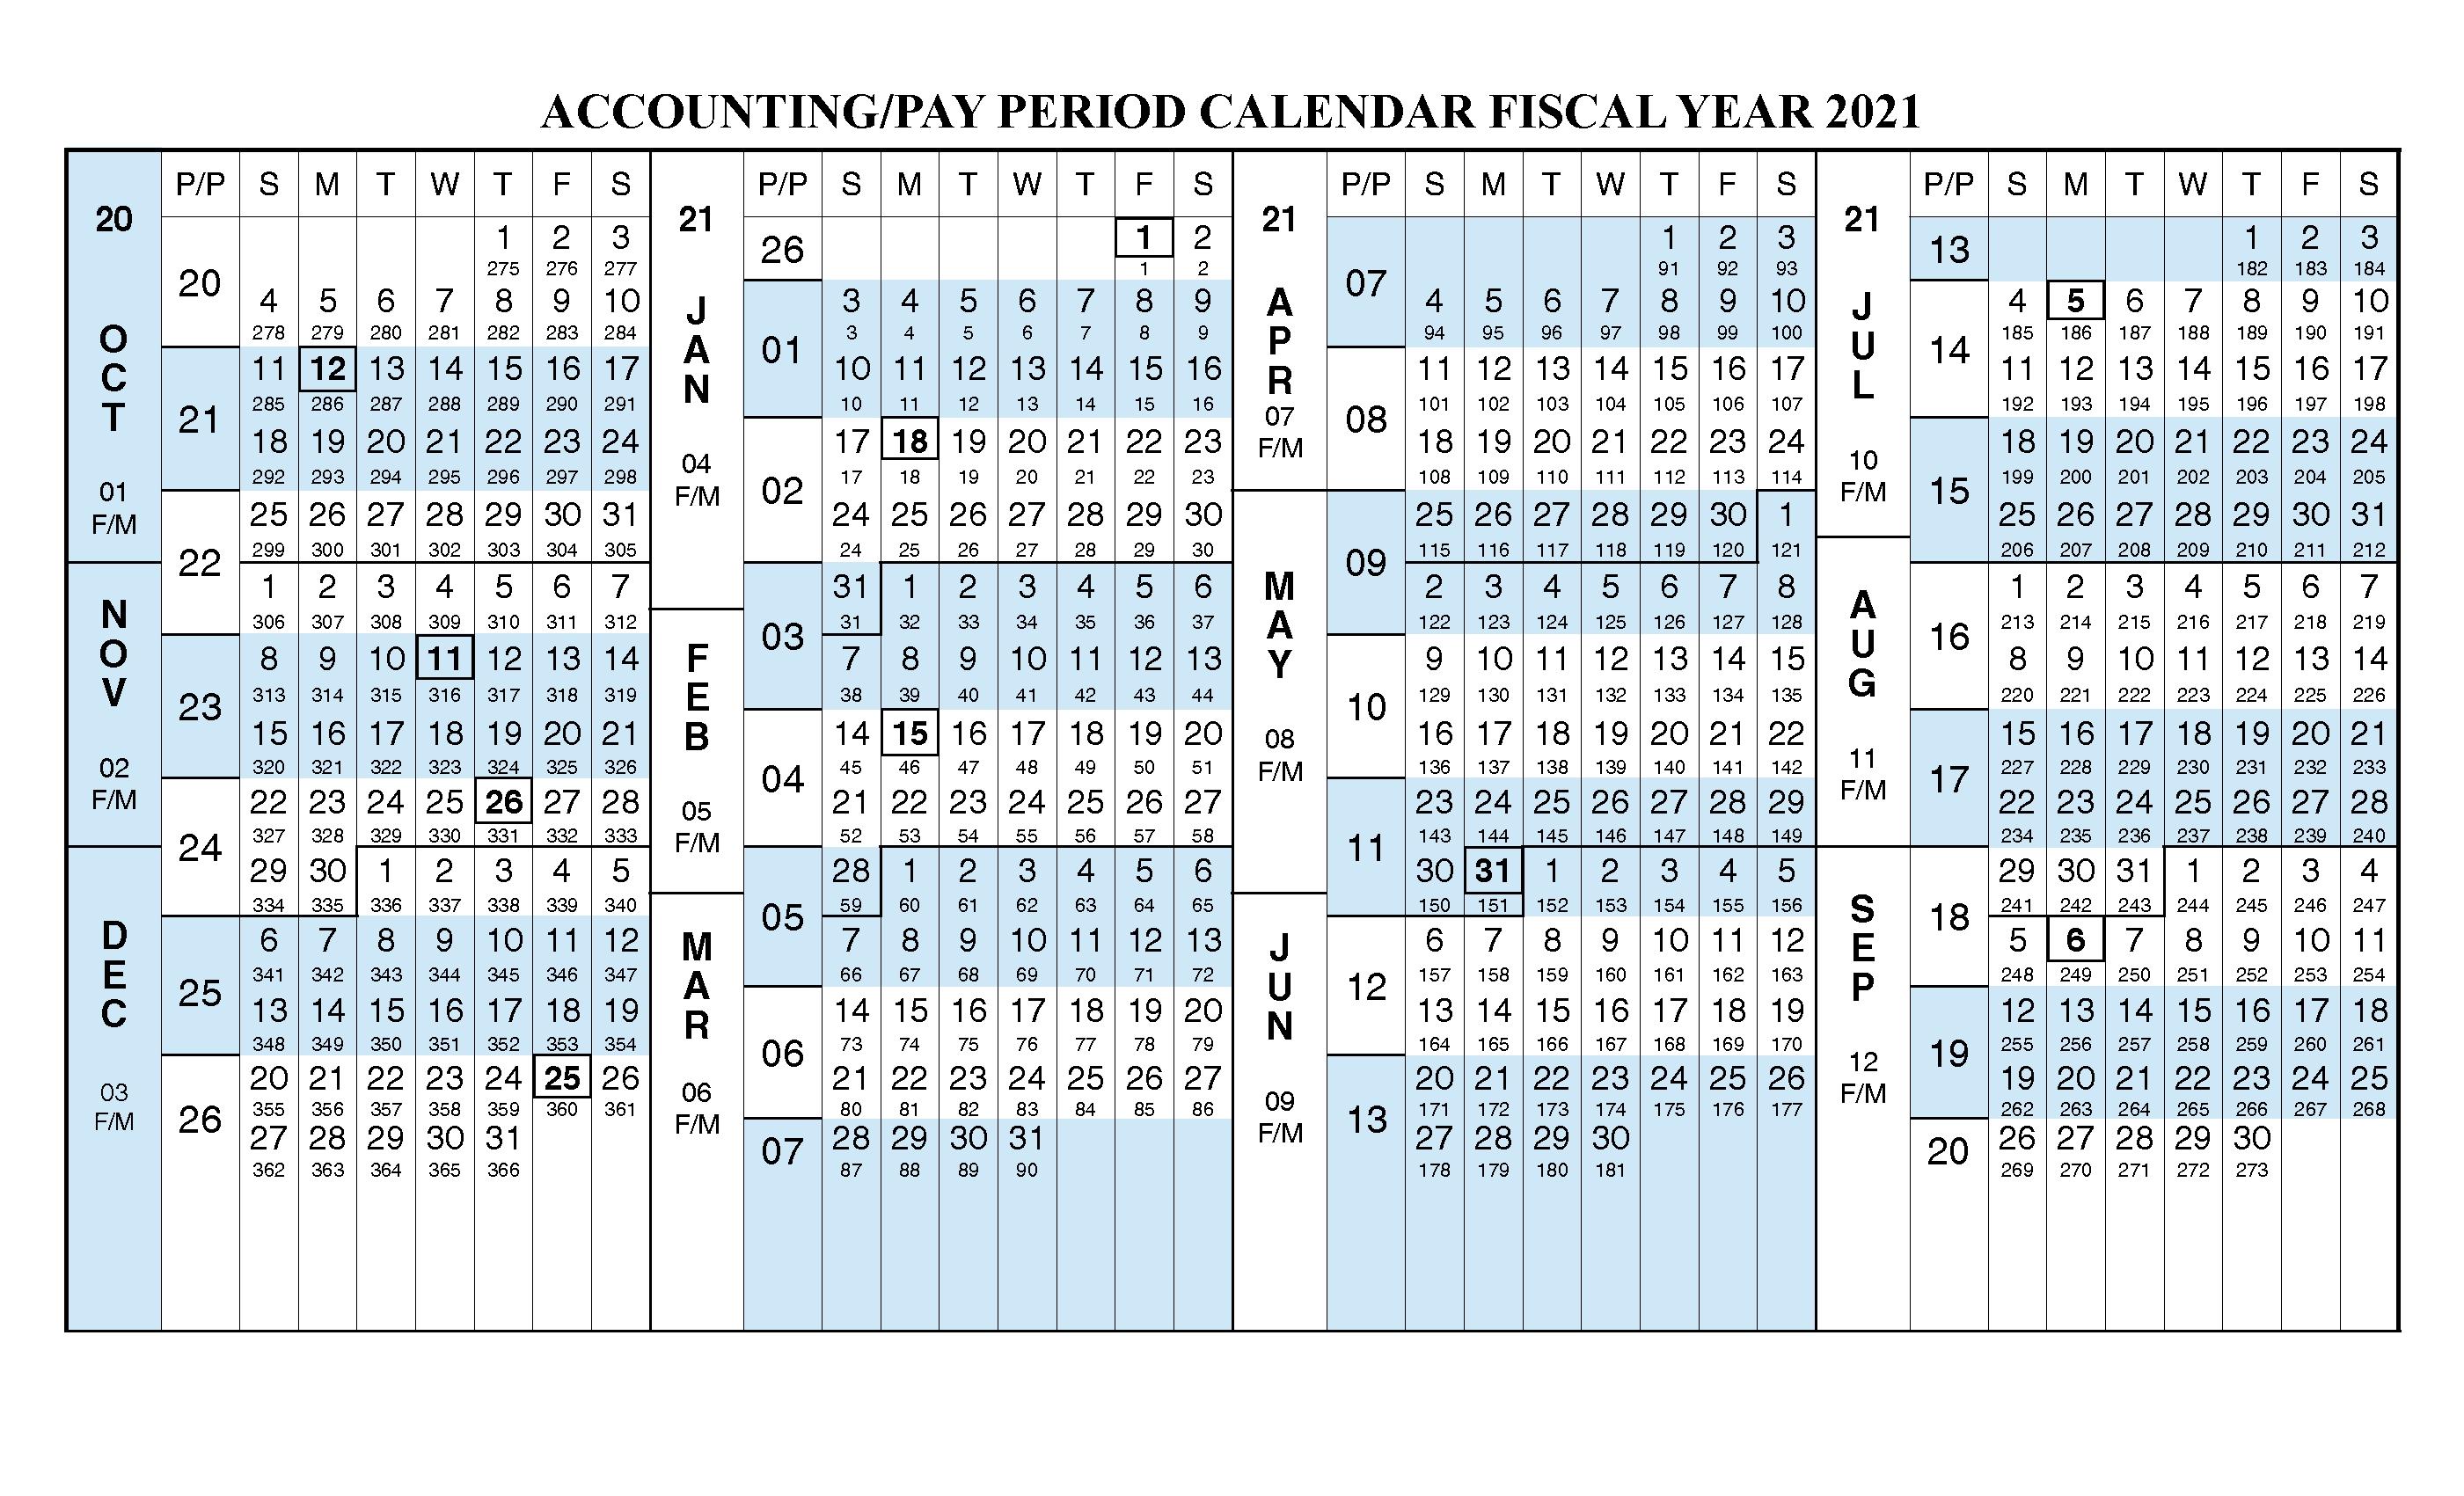 Payroll Calendar 2021 Fiscal Year Calendar [ Oct 2020 - Sep 2021 for Federal Pay Period Calendar 2020